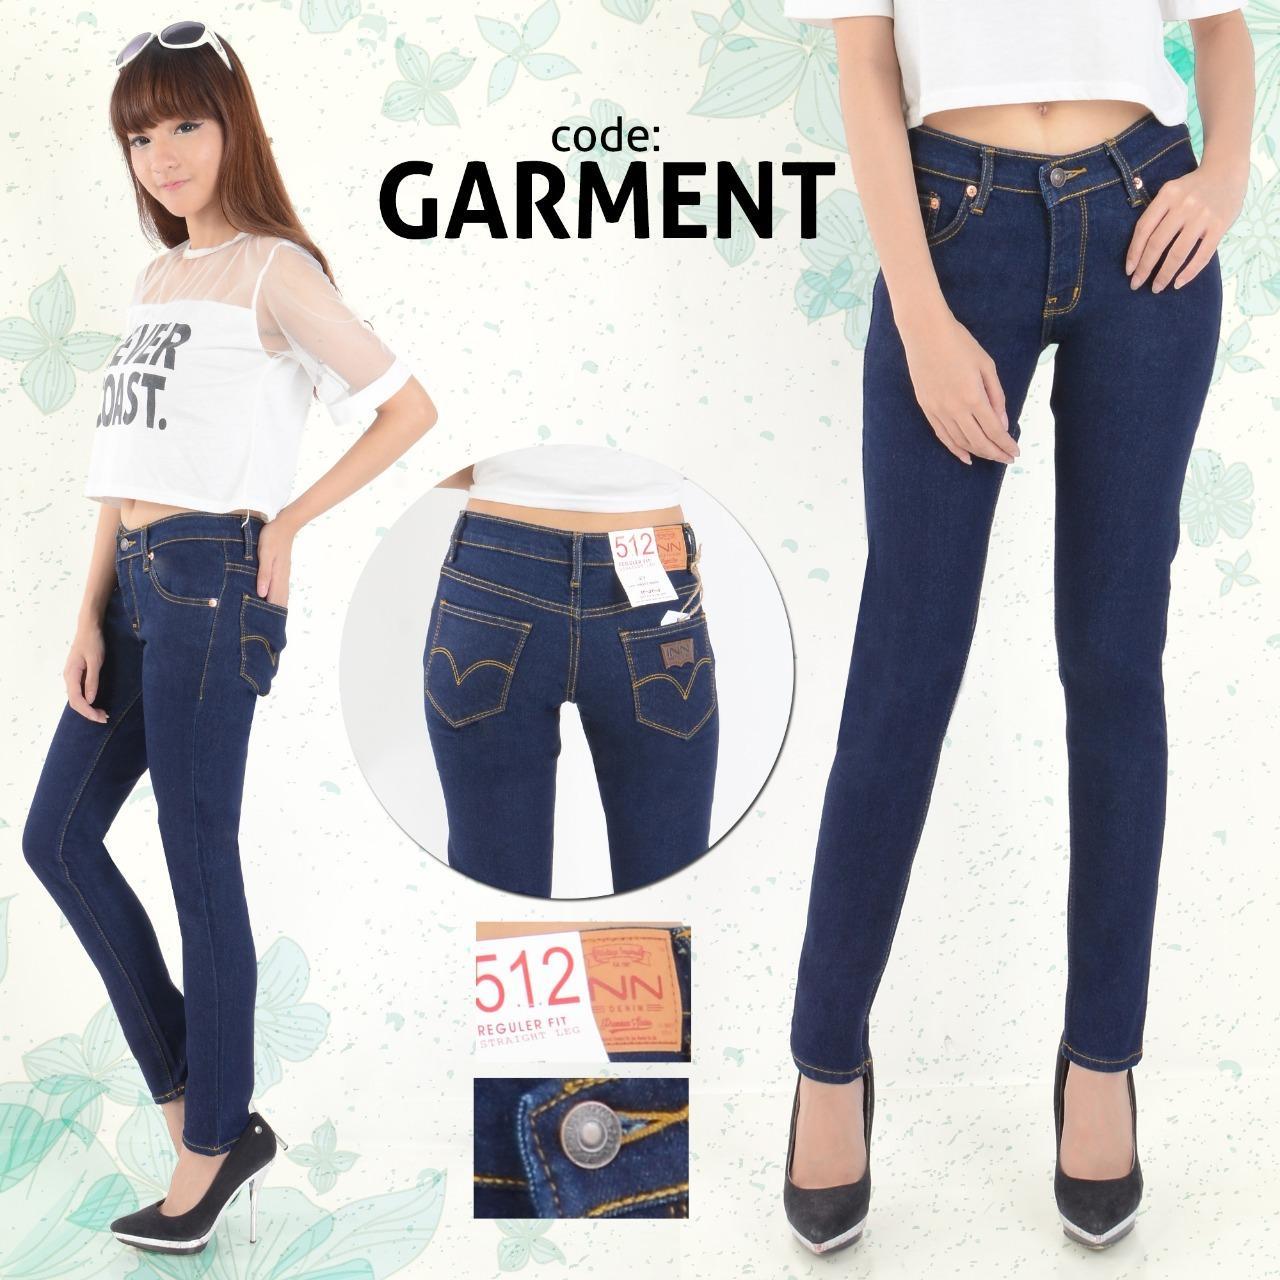 Promo Nusantara Jeans Celana Panjang Wanita Model Skinny Berbahan Soft Jeans Ripped Resleting Kuat Jahitan Rapi Murah Biru Dongker Di Dki Jakarta